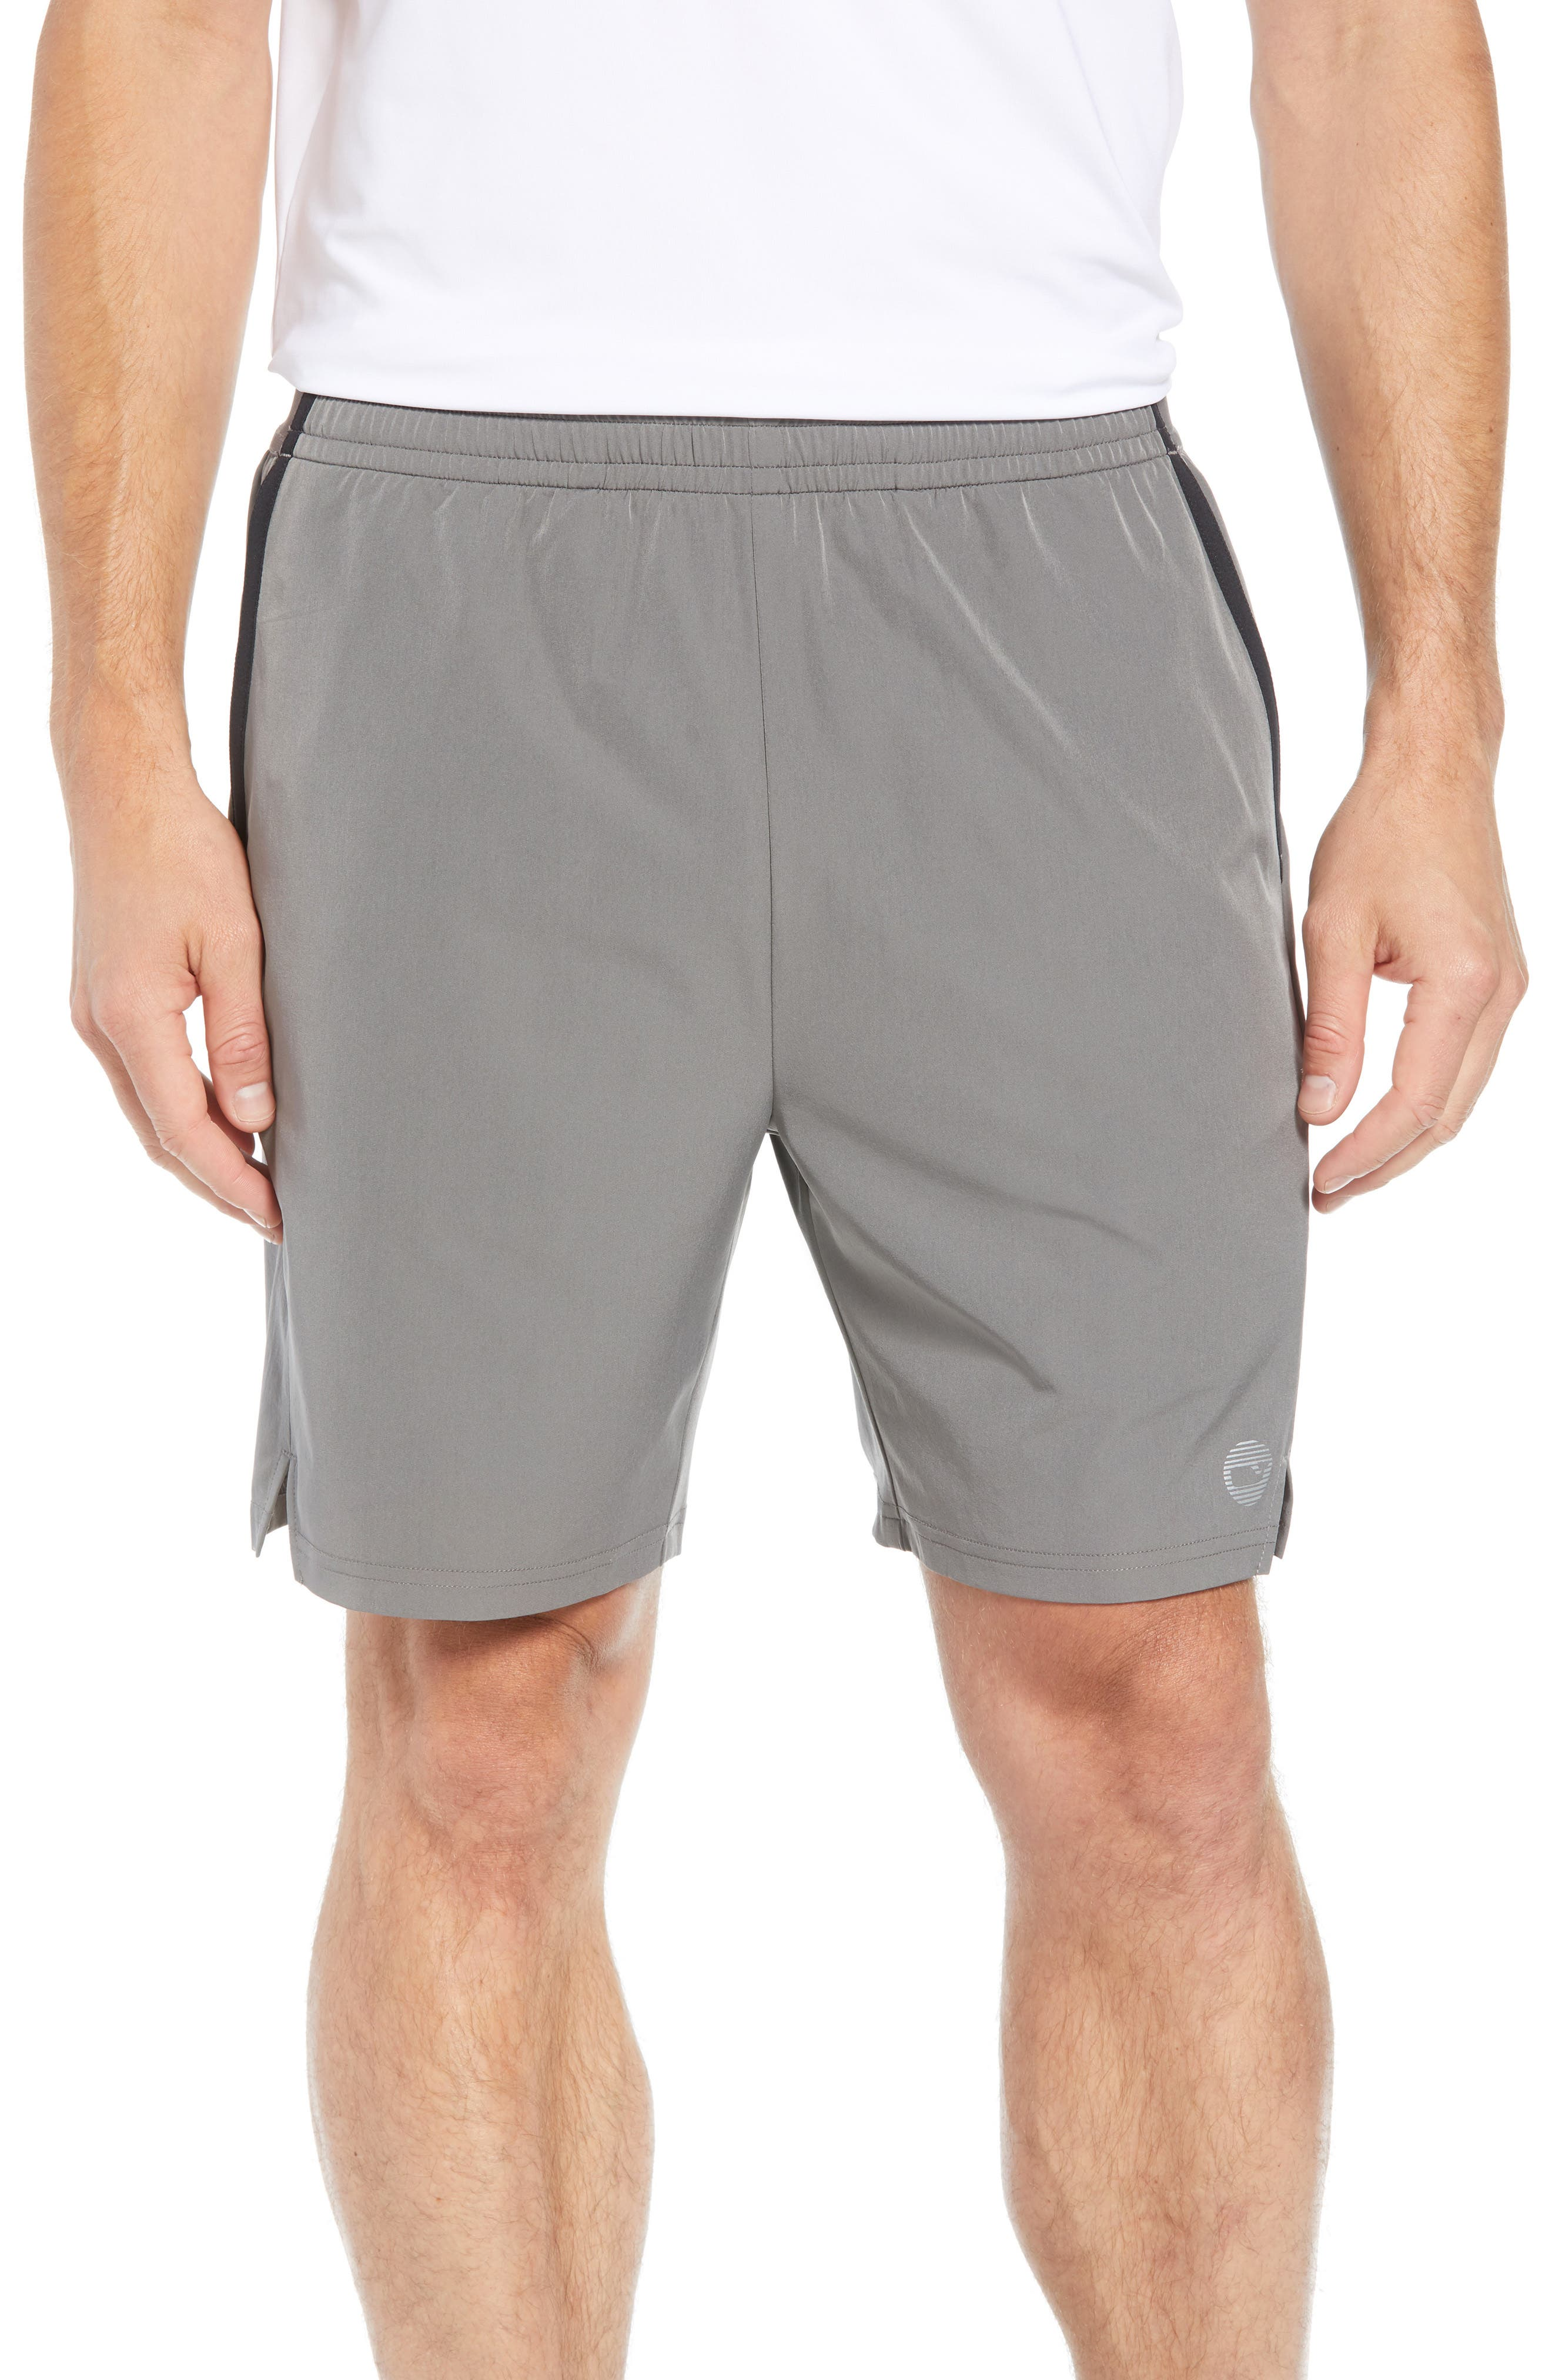 Active Tennis Shorts,                             Main thumbnail 1, color,                             GRAPHITE